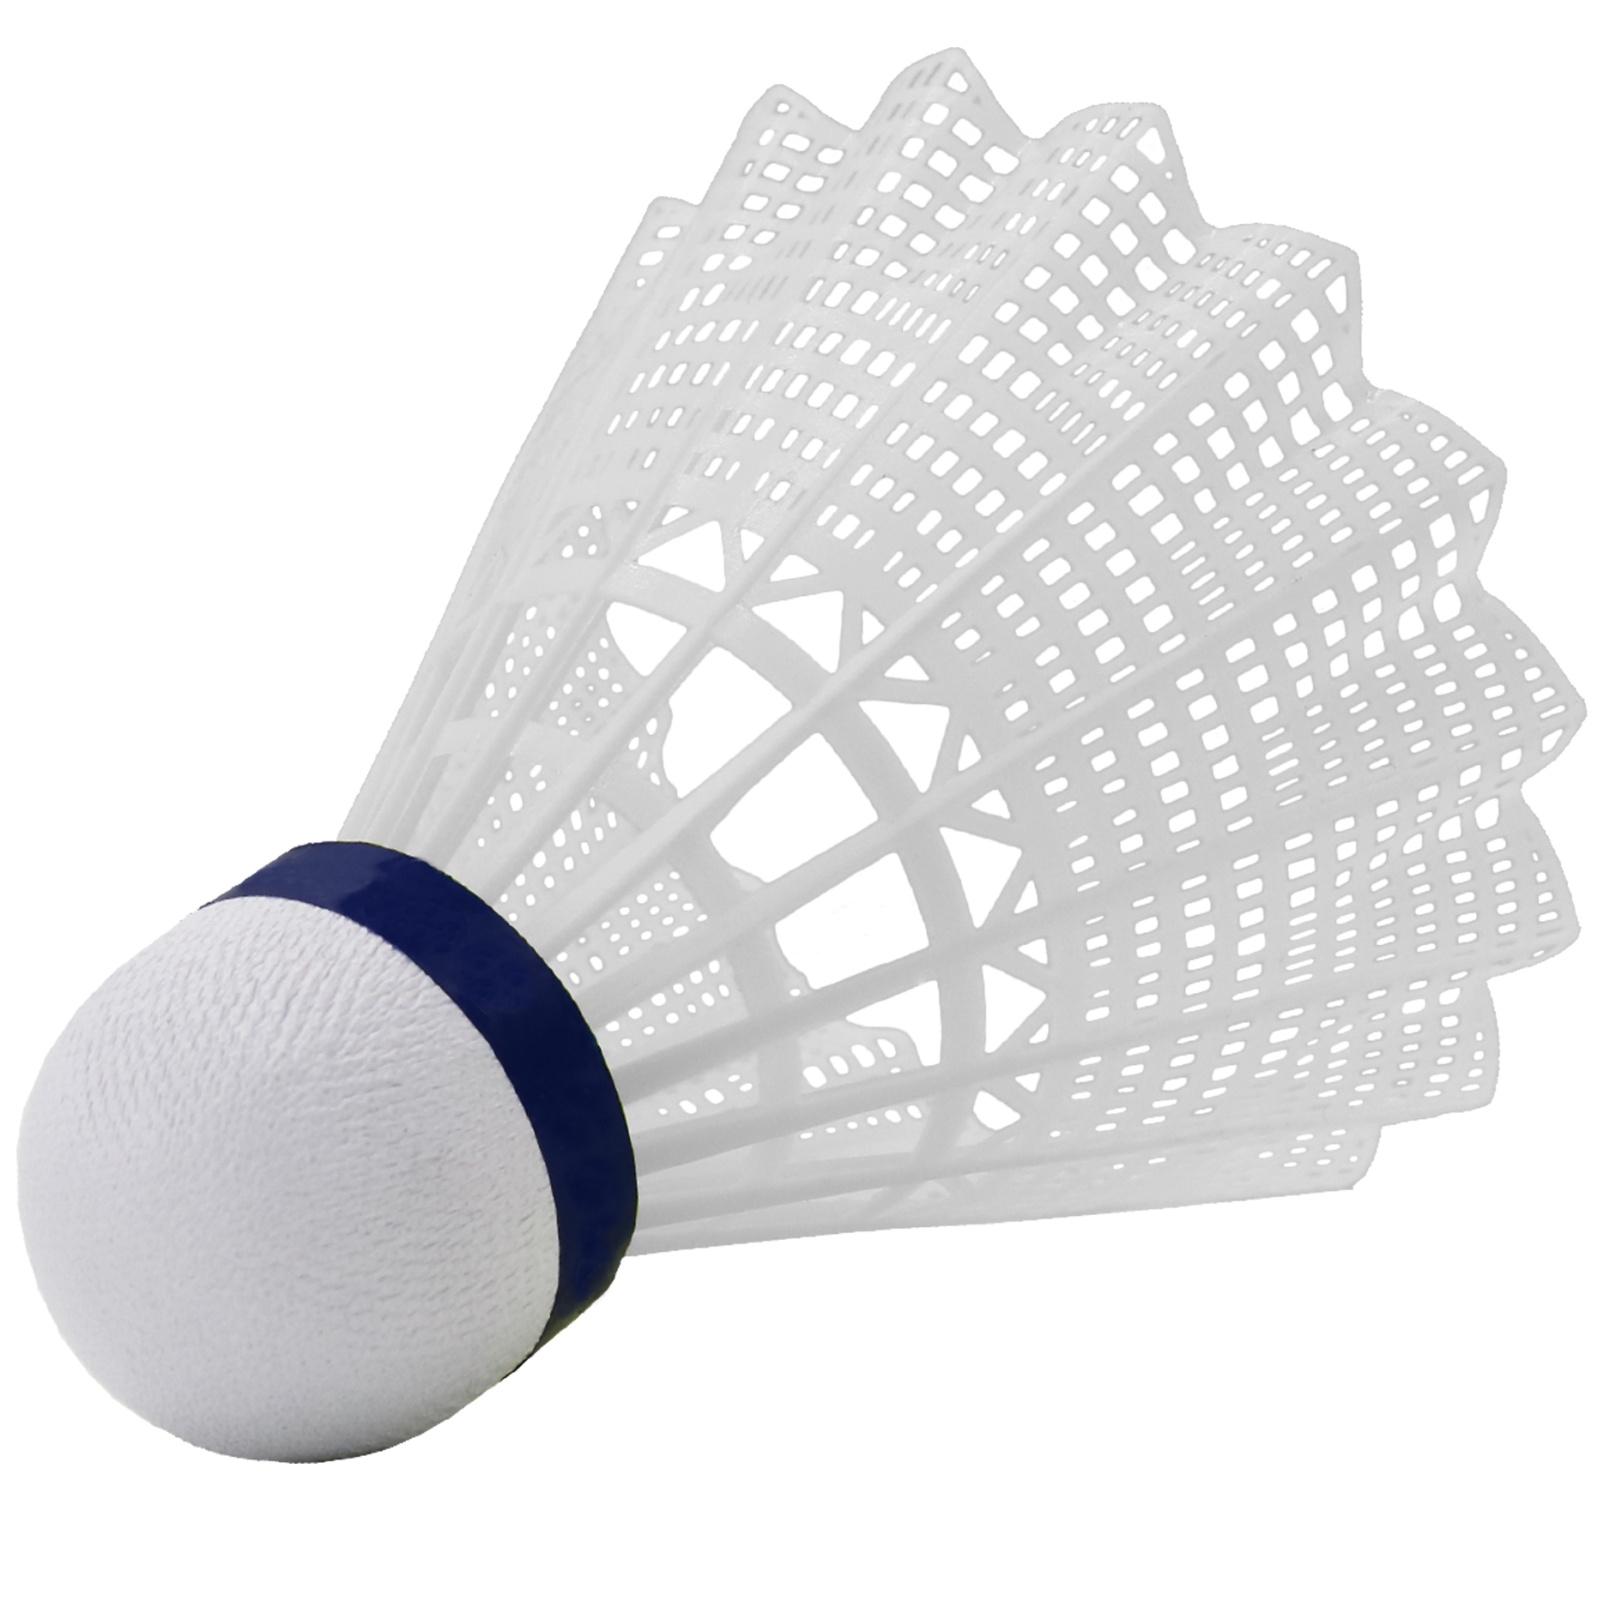 Badmintonové míčky WISH Air Flow 5000 - bílé 6ks